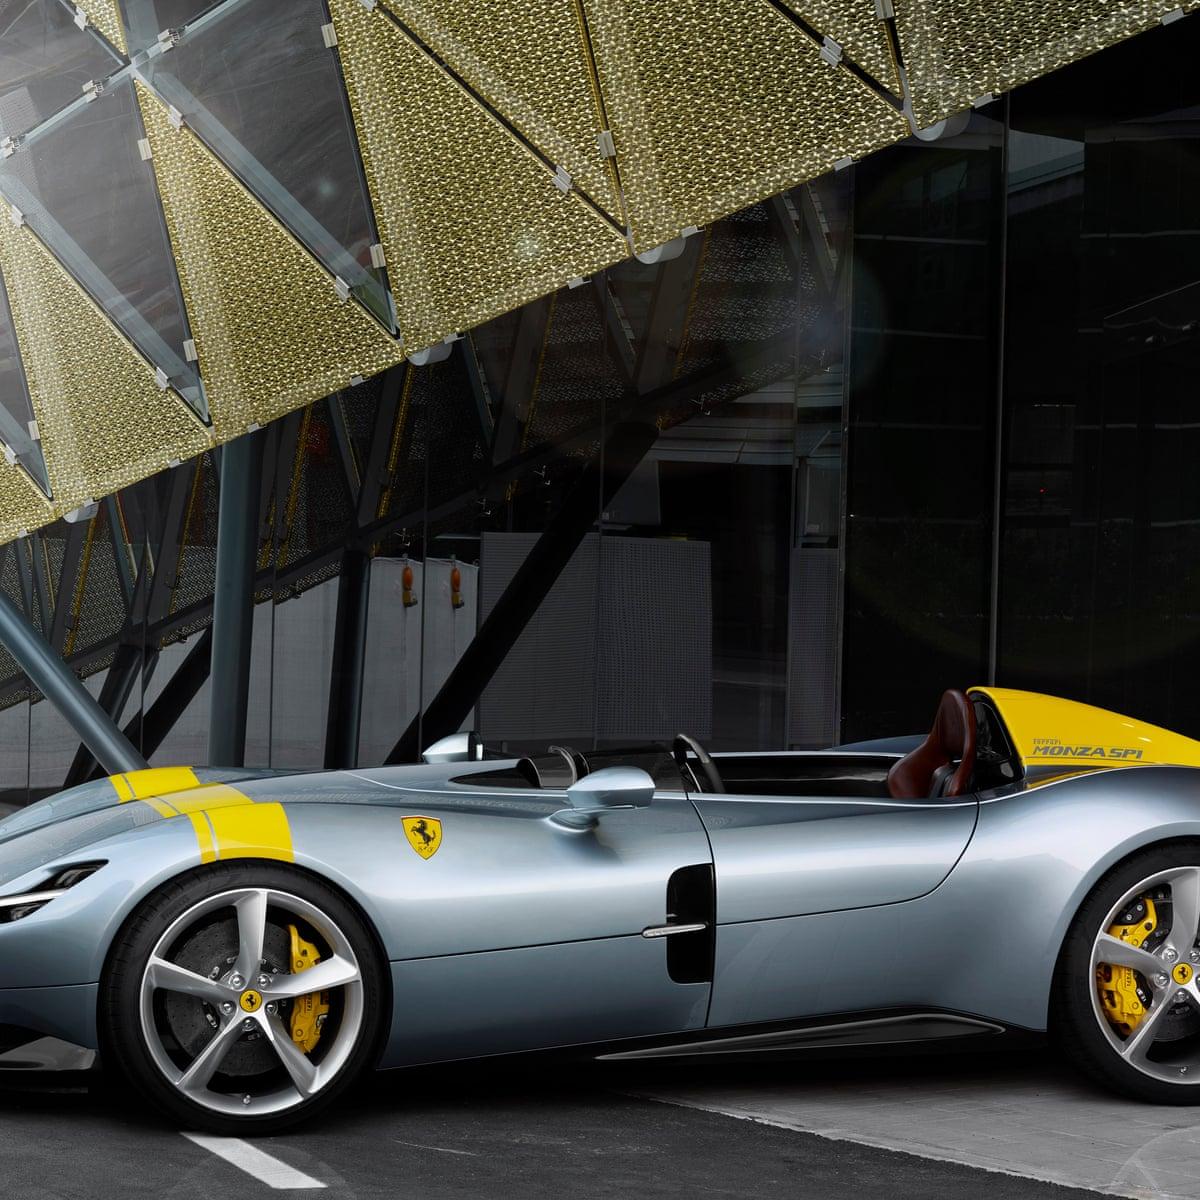 Ferrari Pre Sells Entire New Supercar Model Despite 1m Price Tag Luxury Goods Sector The Guardian